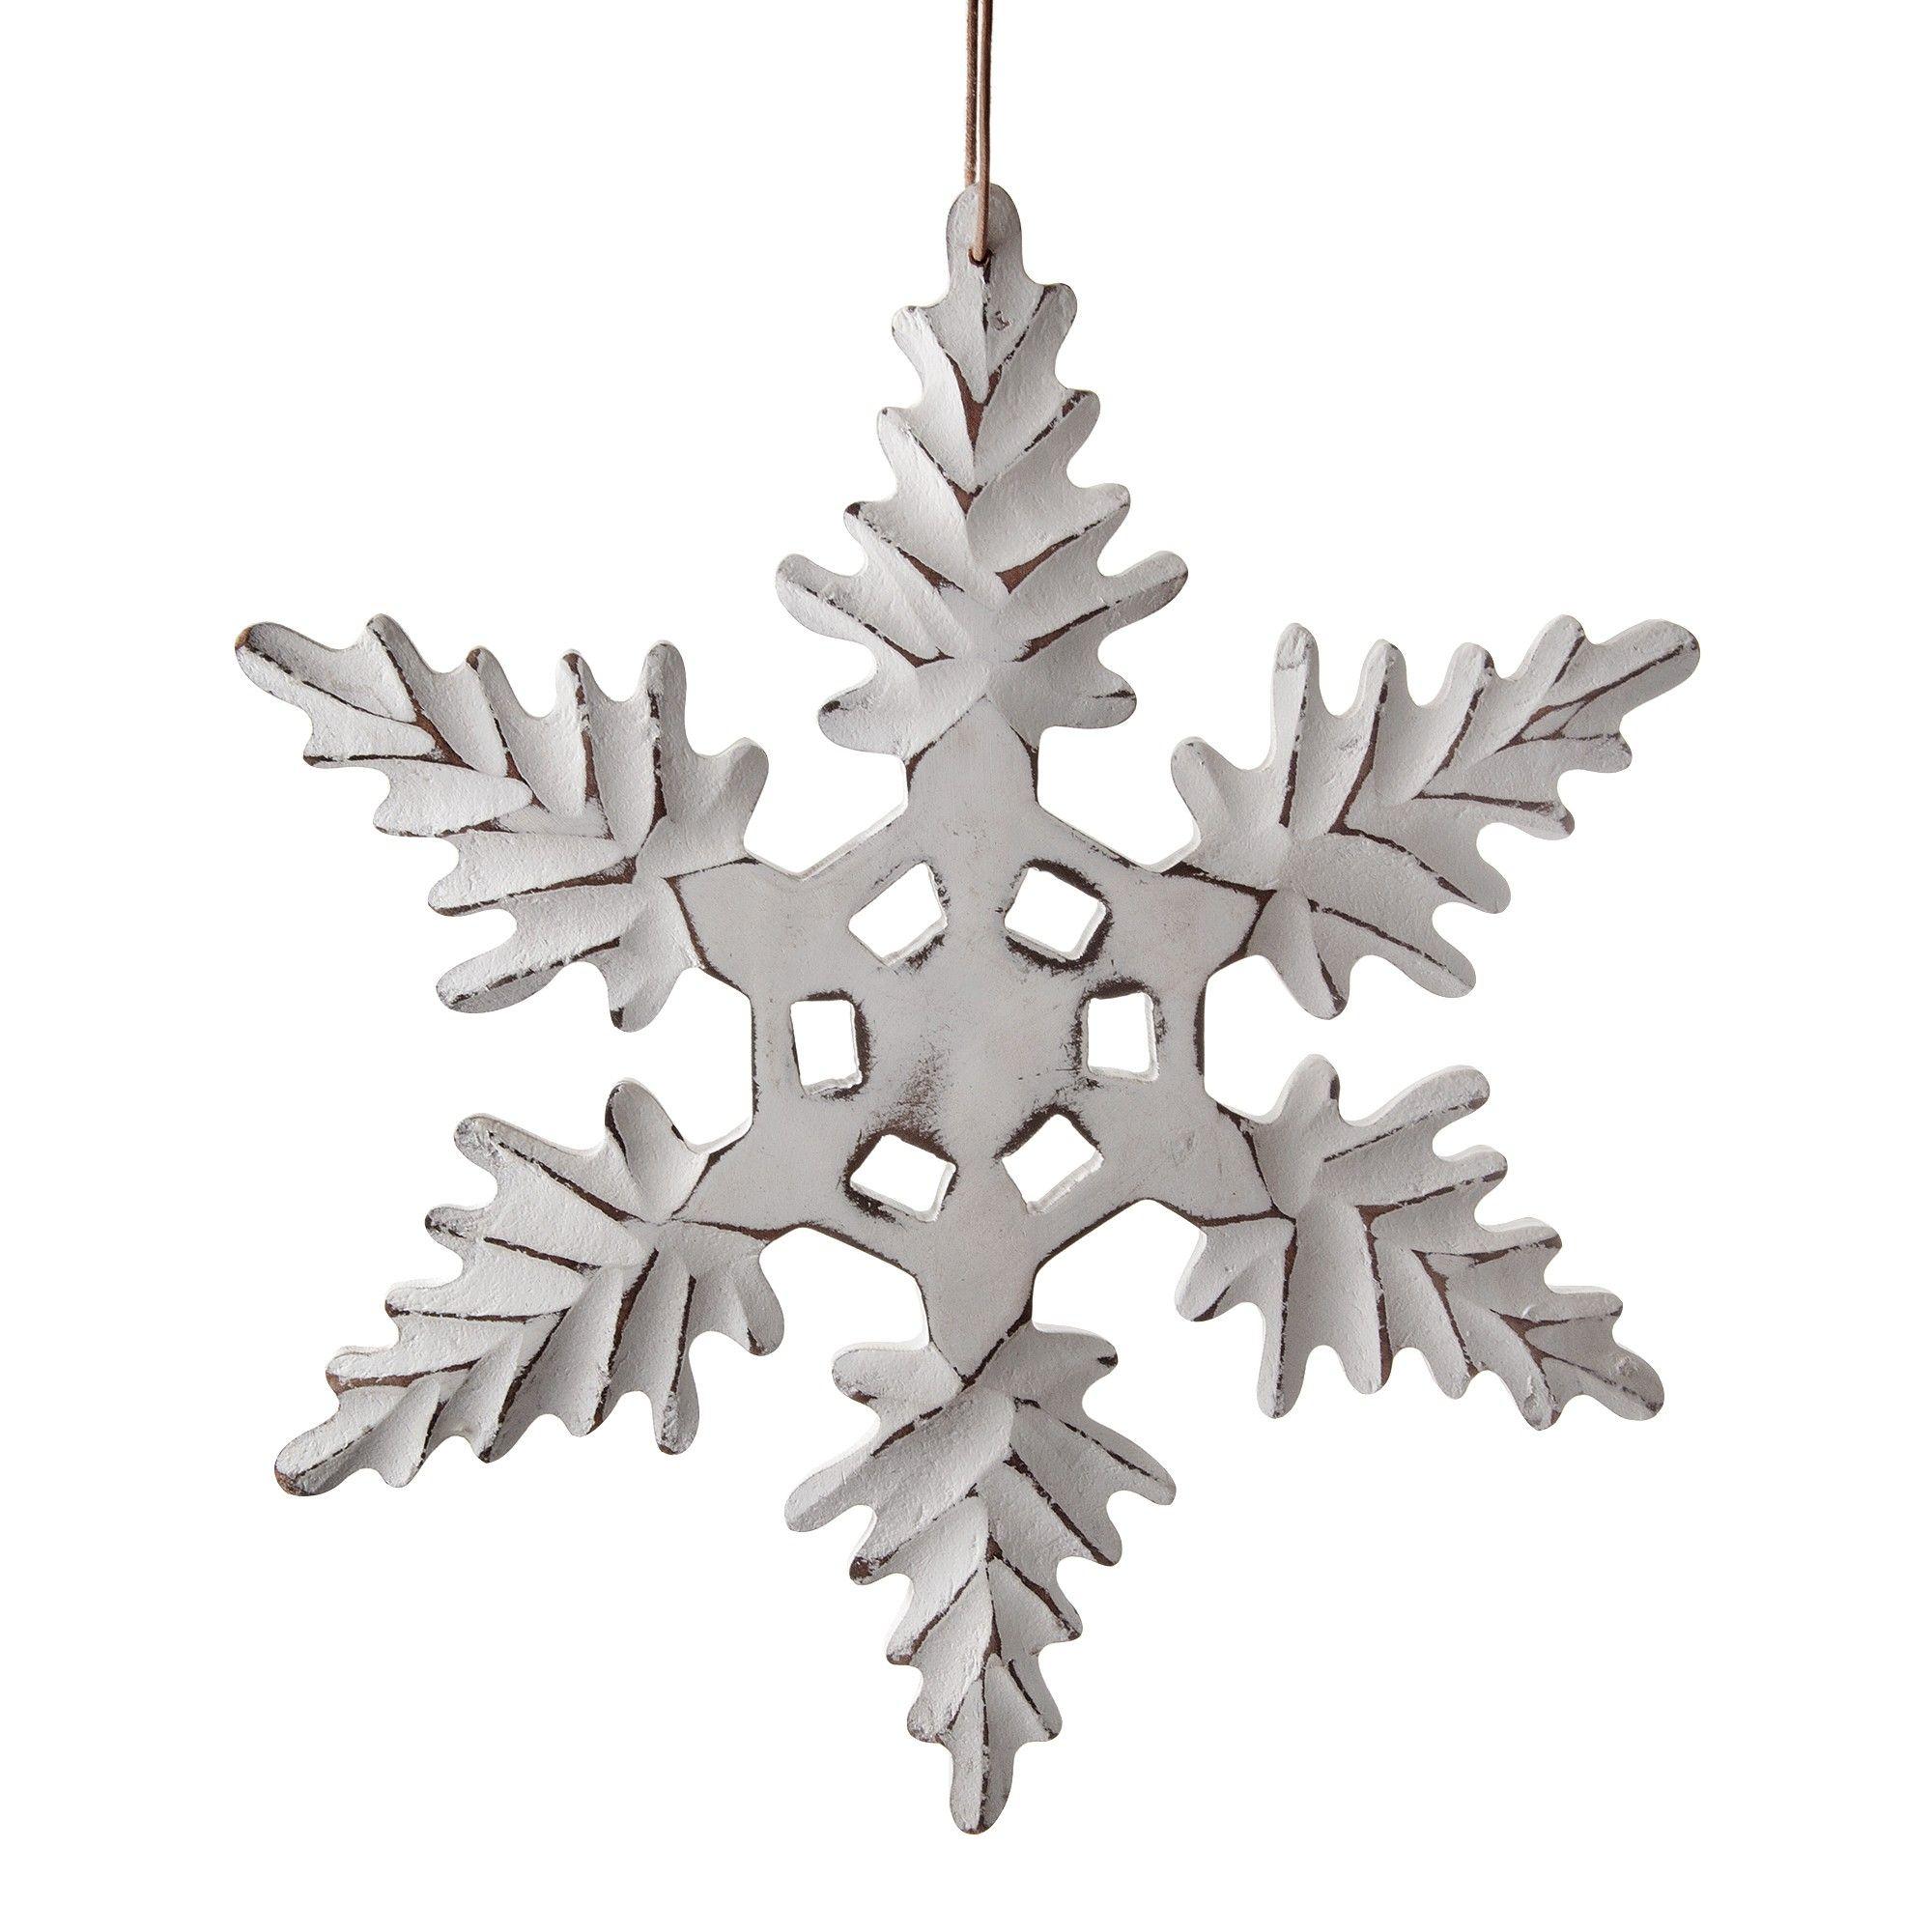 Wooden Ornament White Snowflake Christmas Decoration 12 99 Wooden Snowflakes Christmas Decorations Christmas Settings